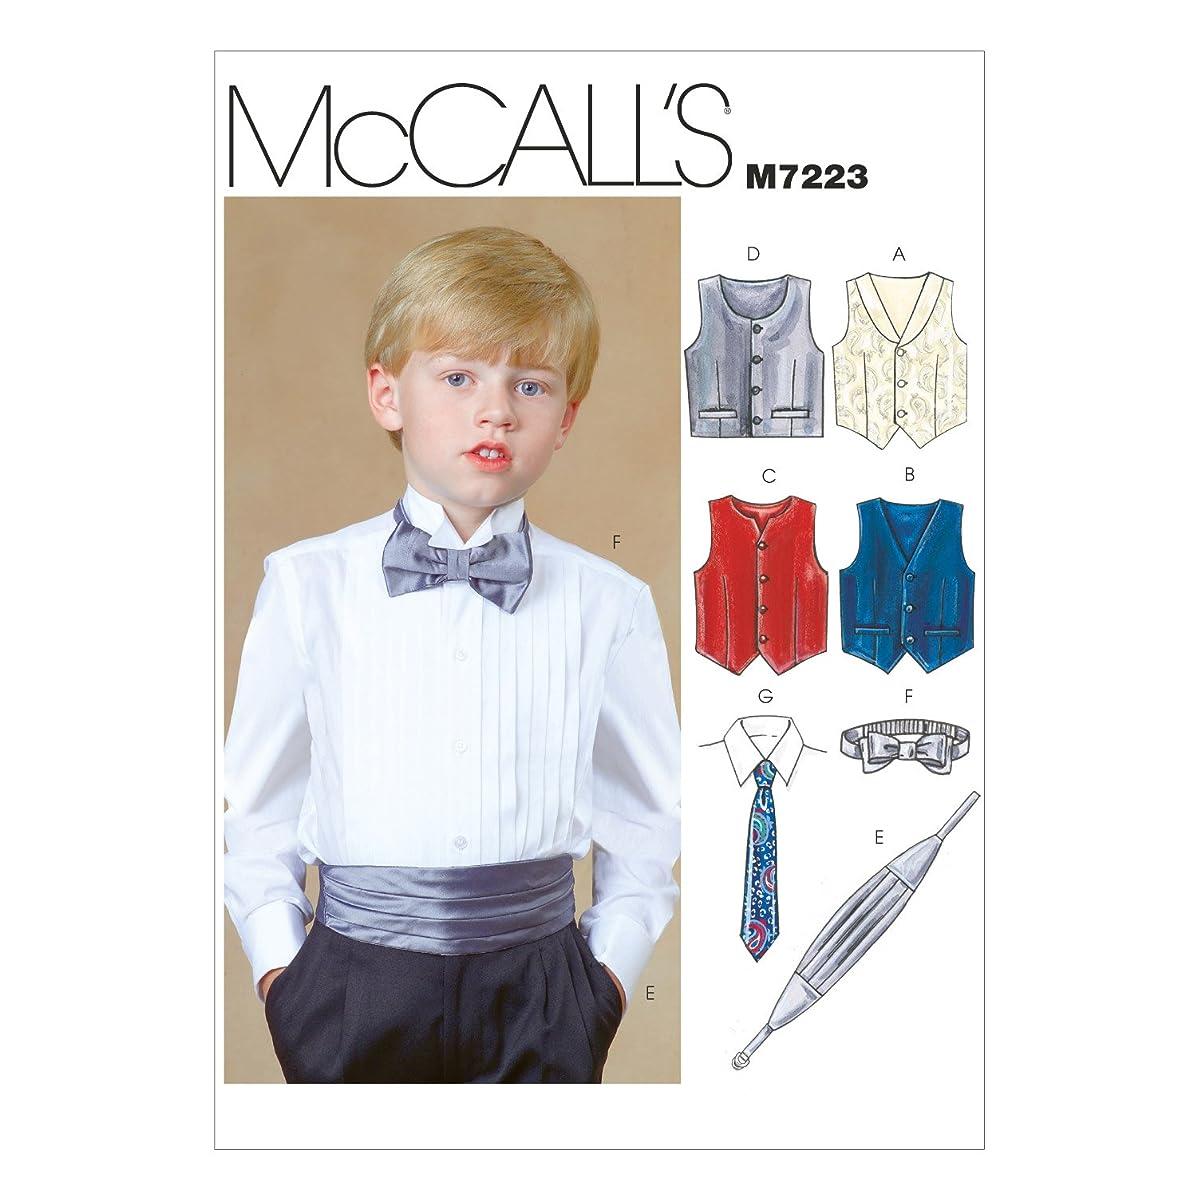 McCall's Patterns M7223 Children's/Boys' Lined Vests, Cummerbund, Bow Tie and Necktie Sewing Template, CHH (7-8-10-12)